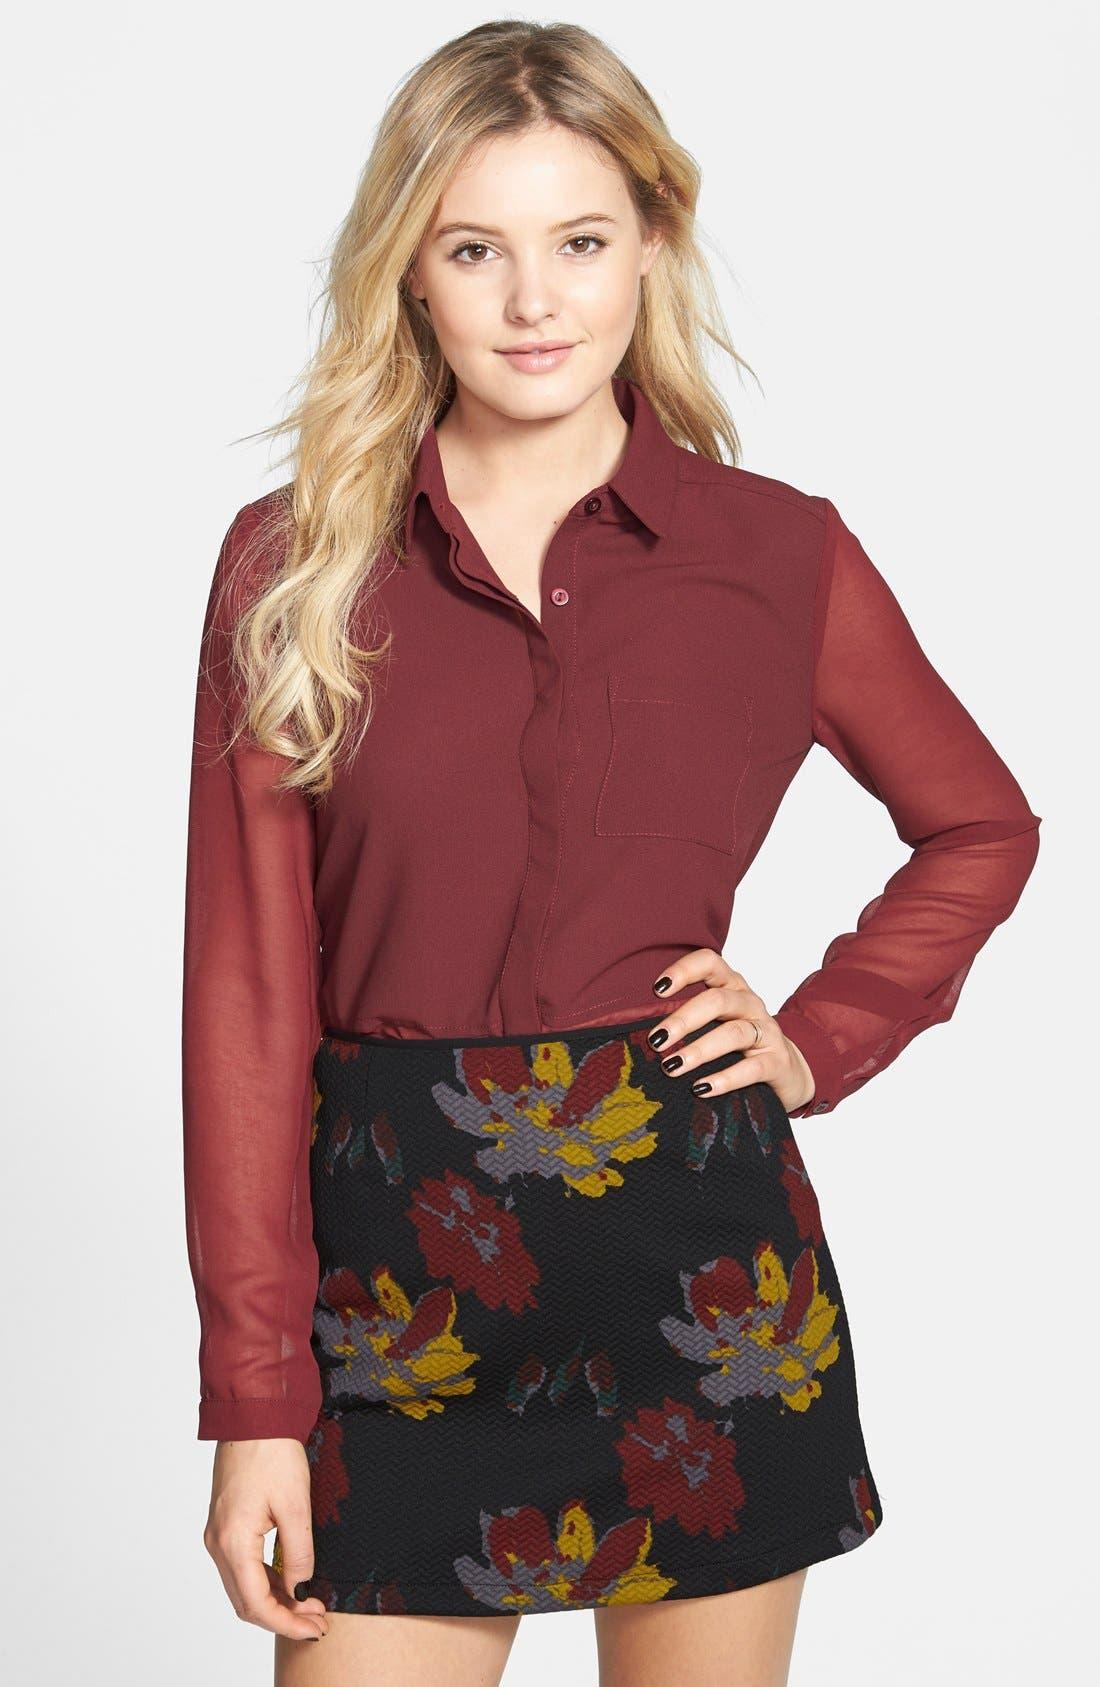 Alternate Image 1 Selected - Lush Print Textured A-Line Skirt (Juniors)